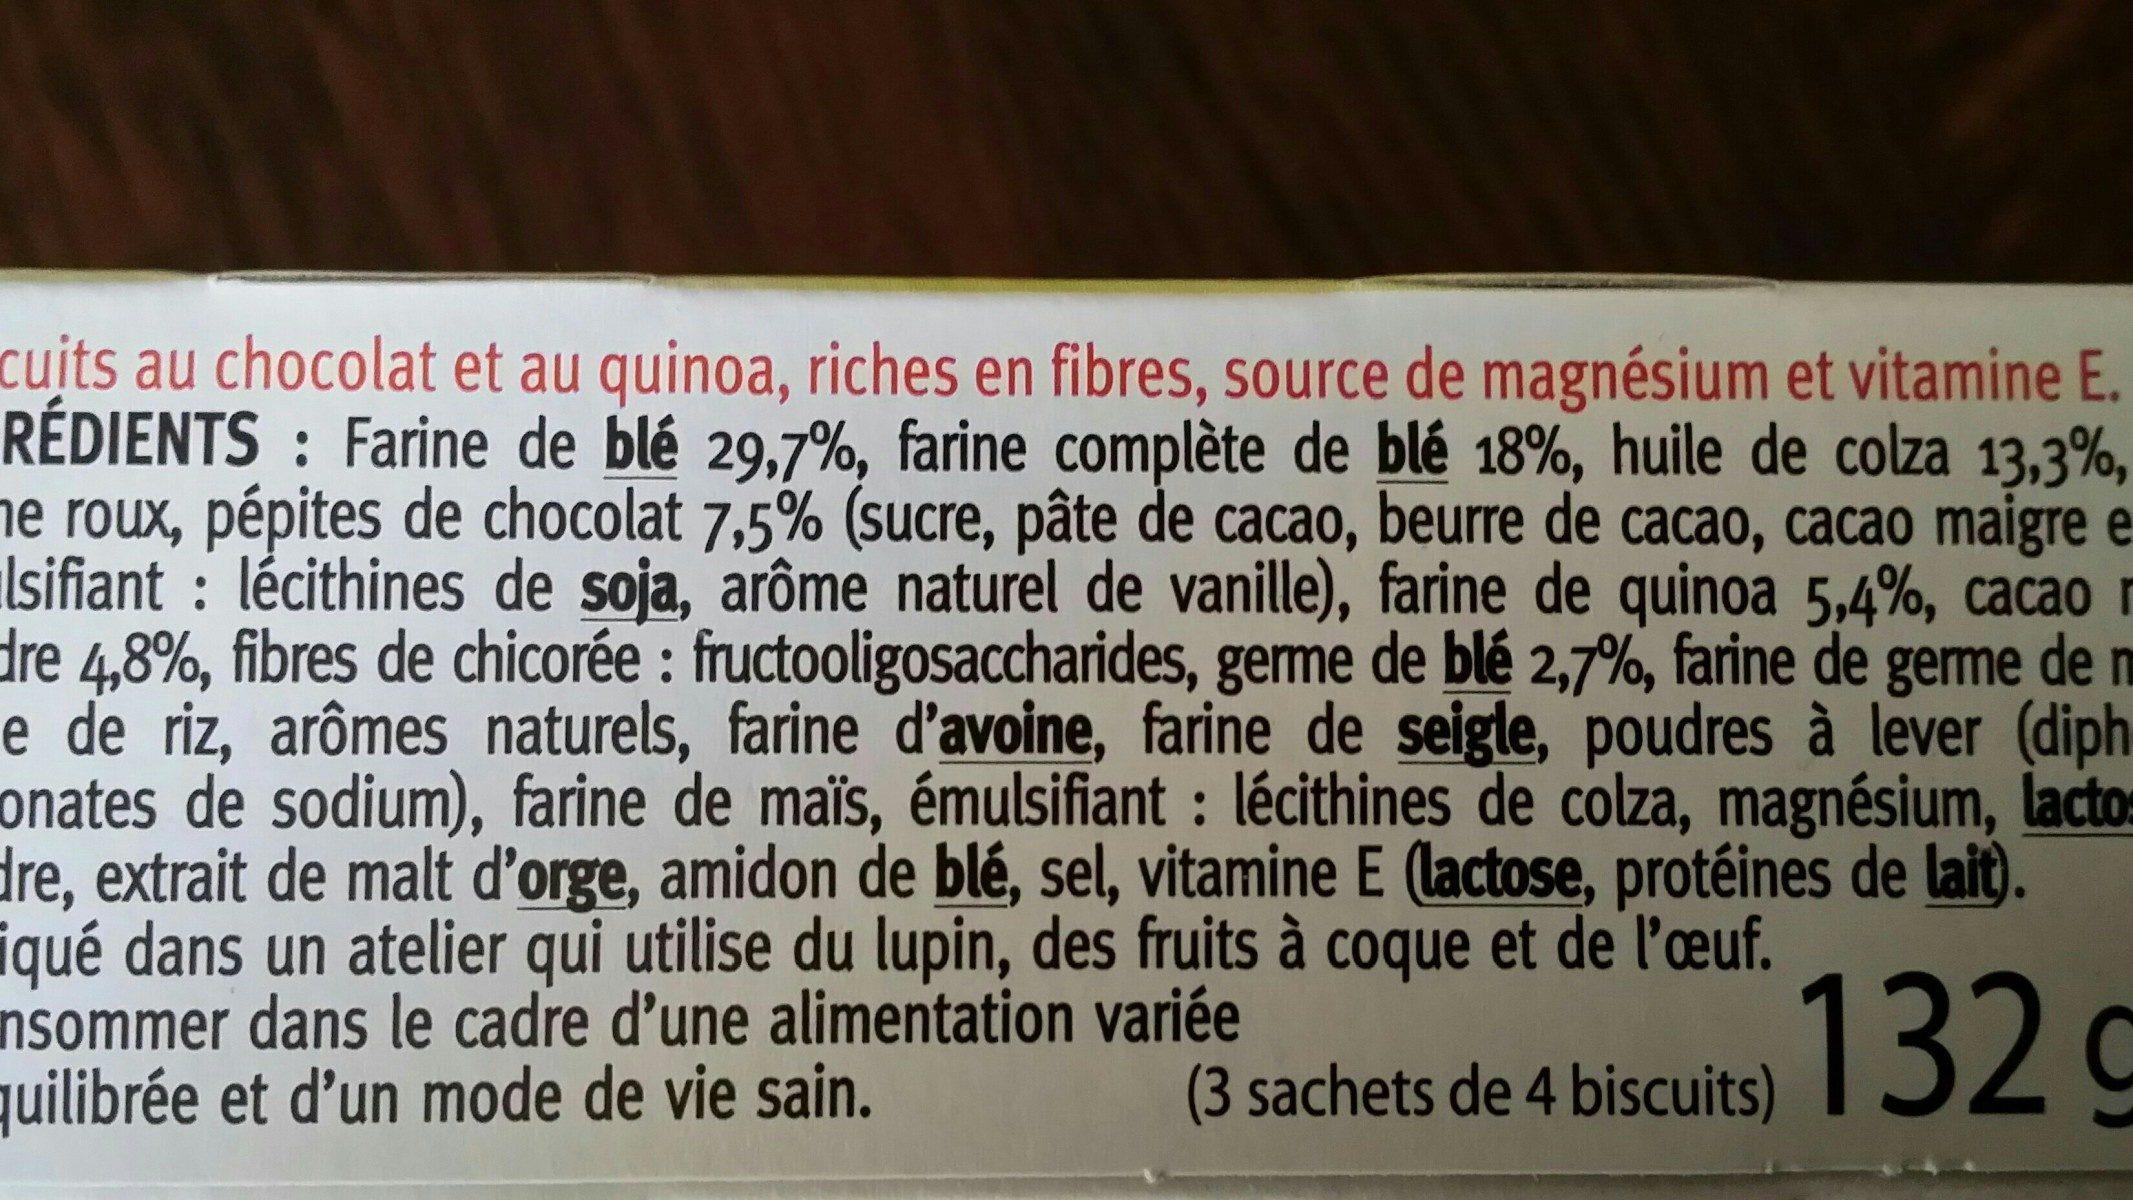 Biscuit quinoa cacao - Ingrédients - fr